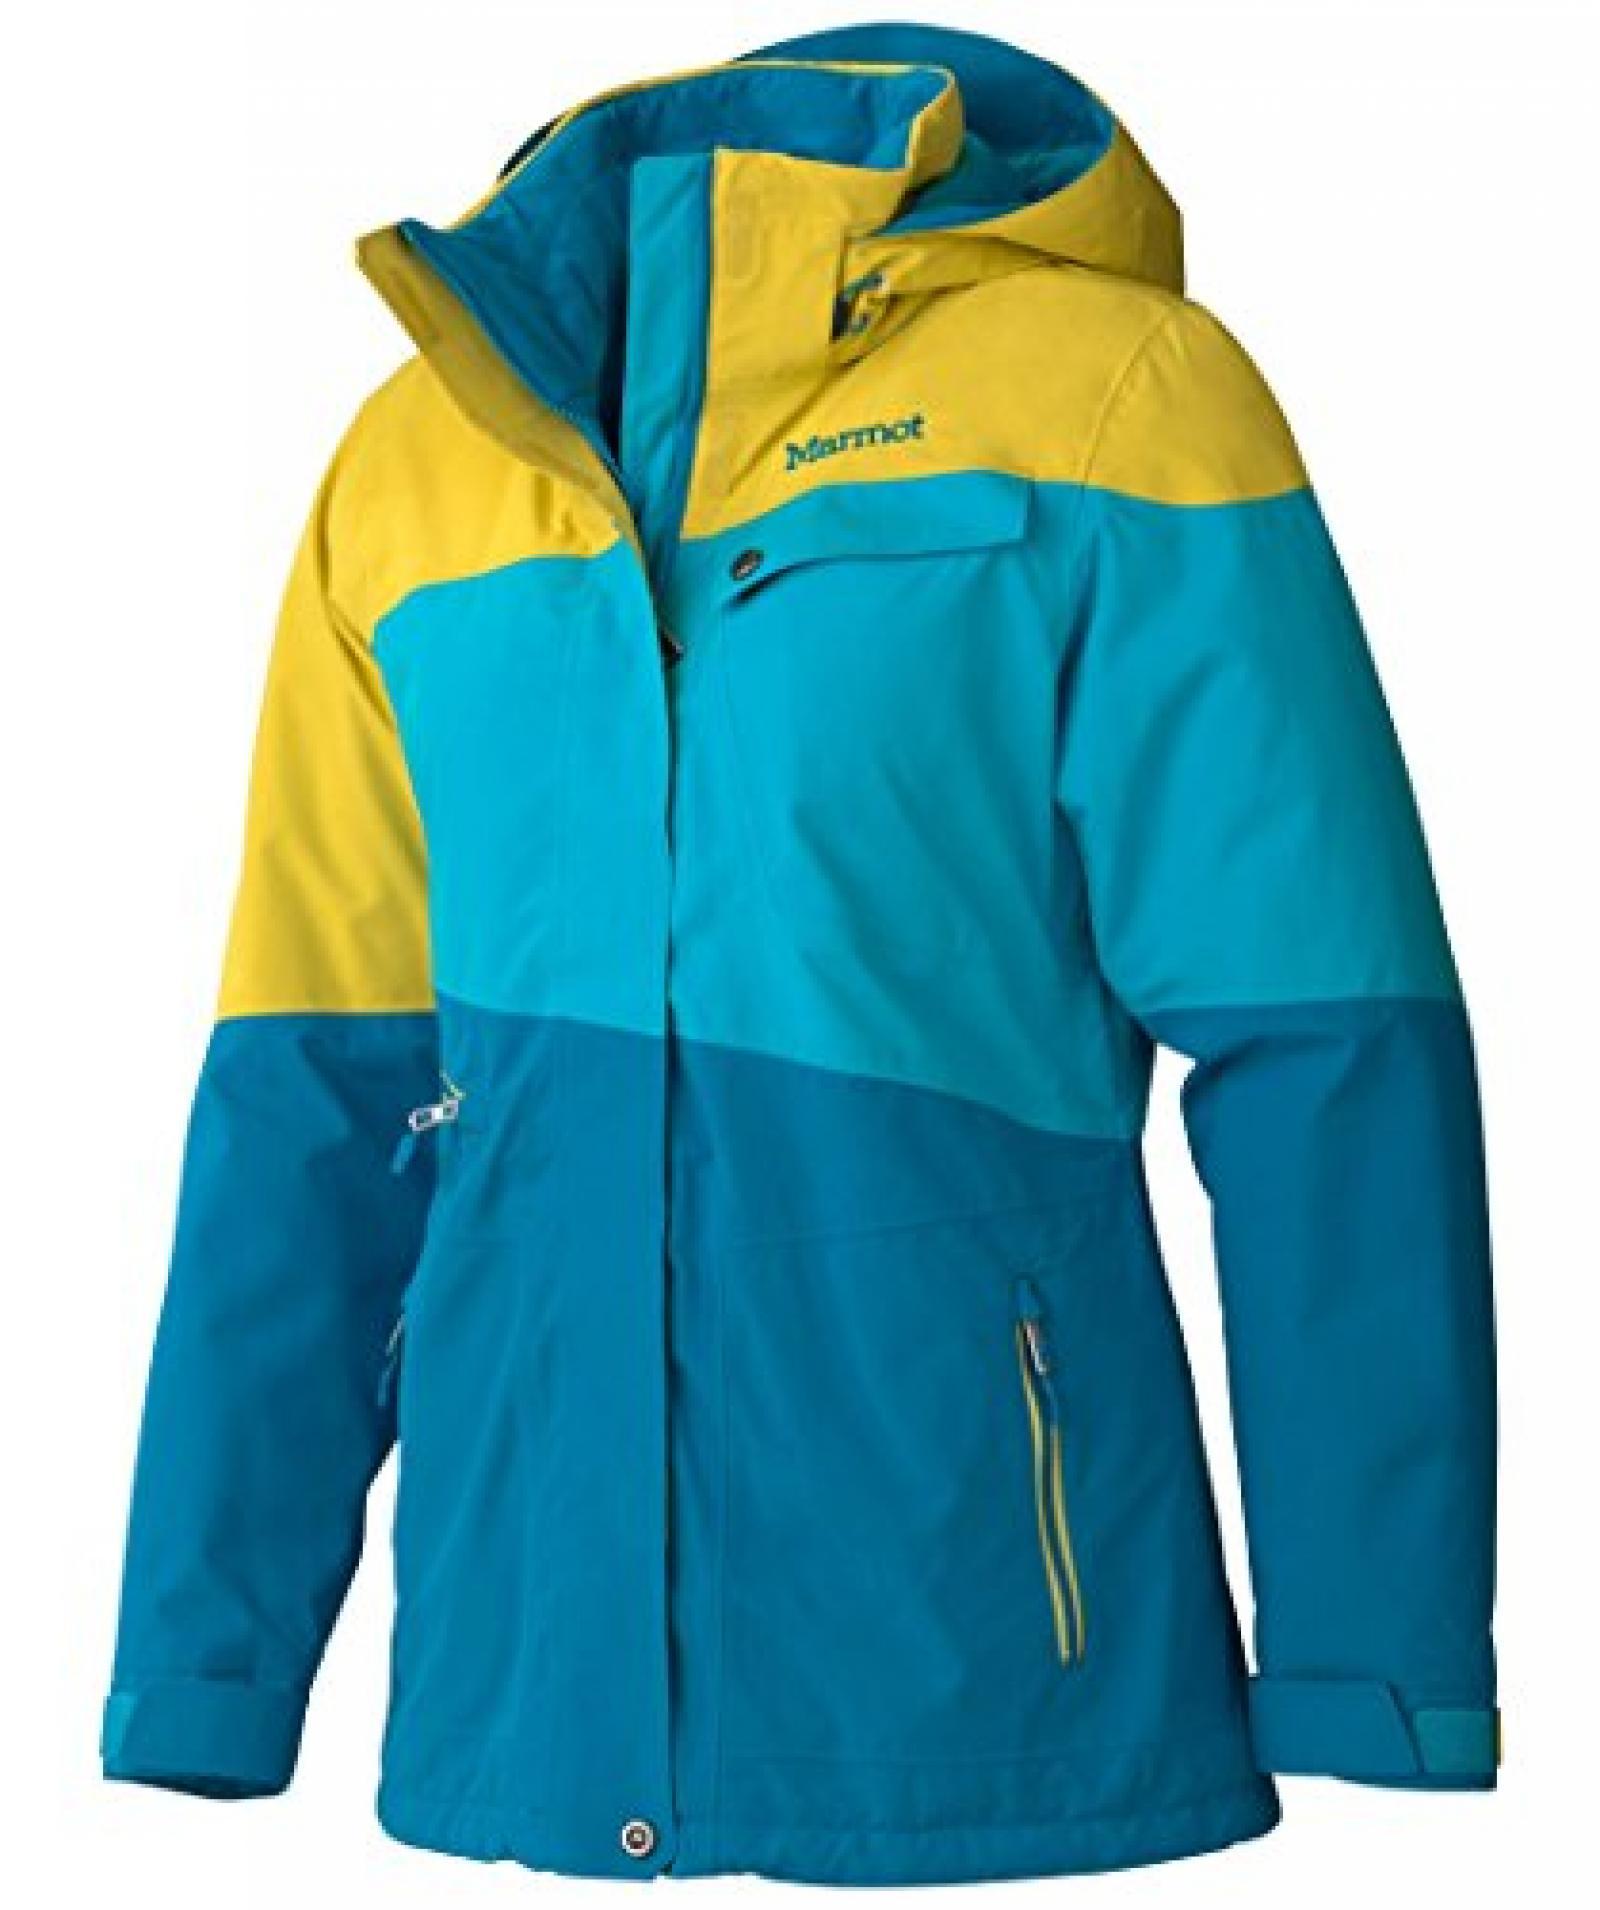 Damen Skijacke Wms Moonshot Jacket